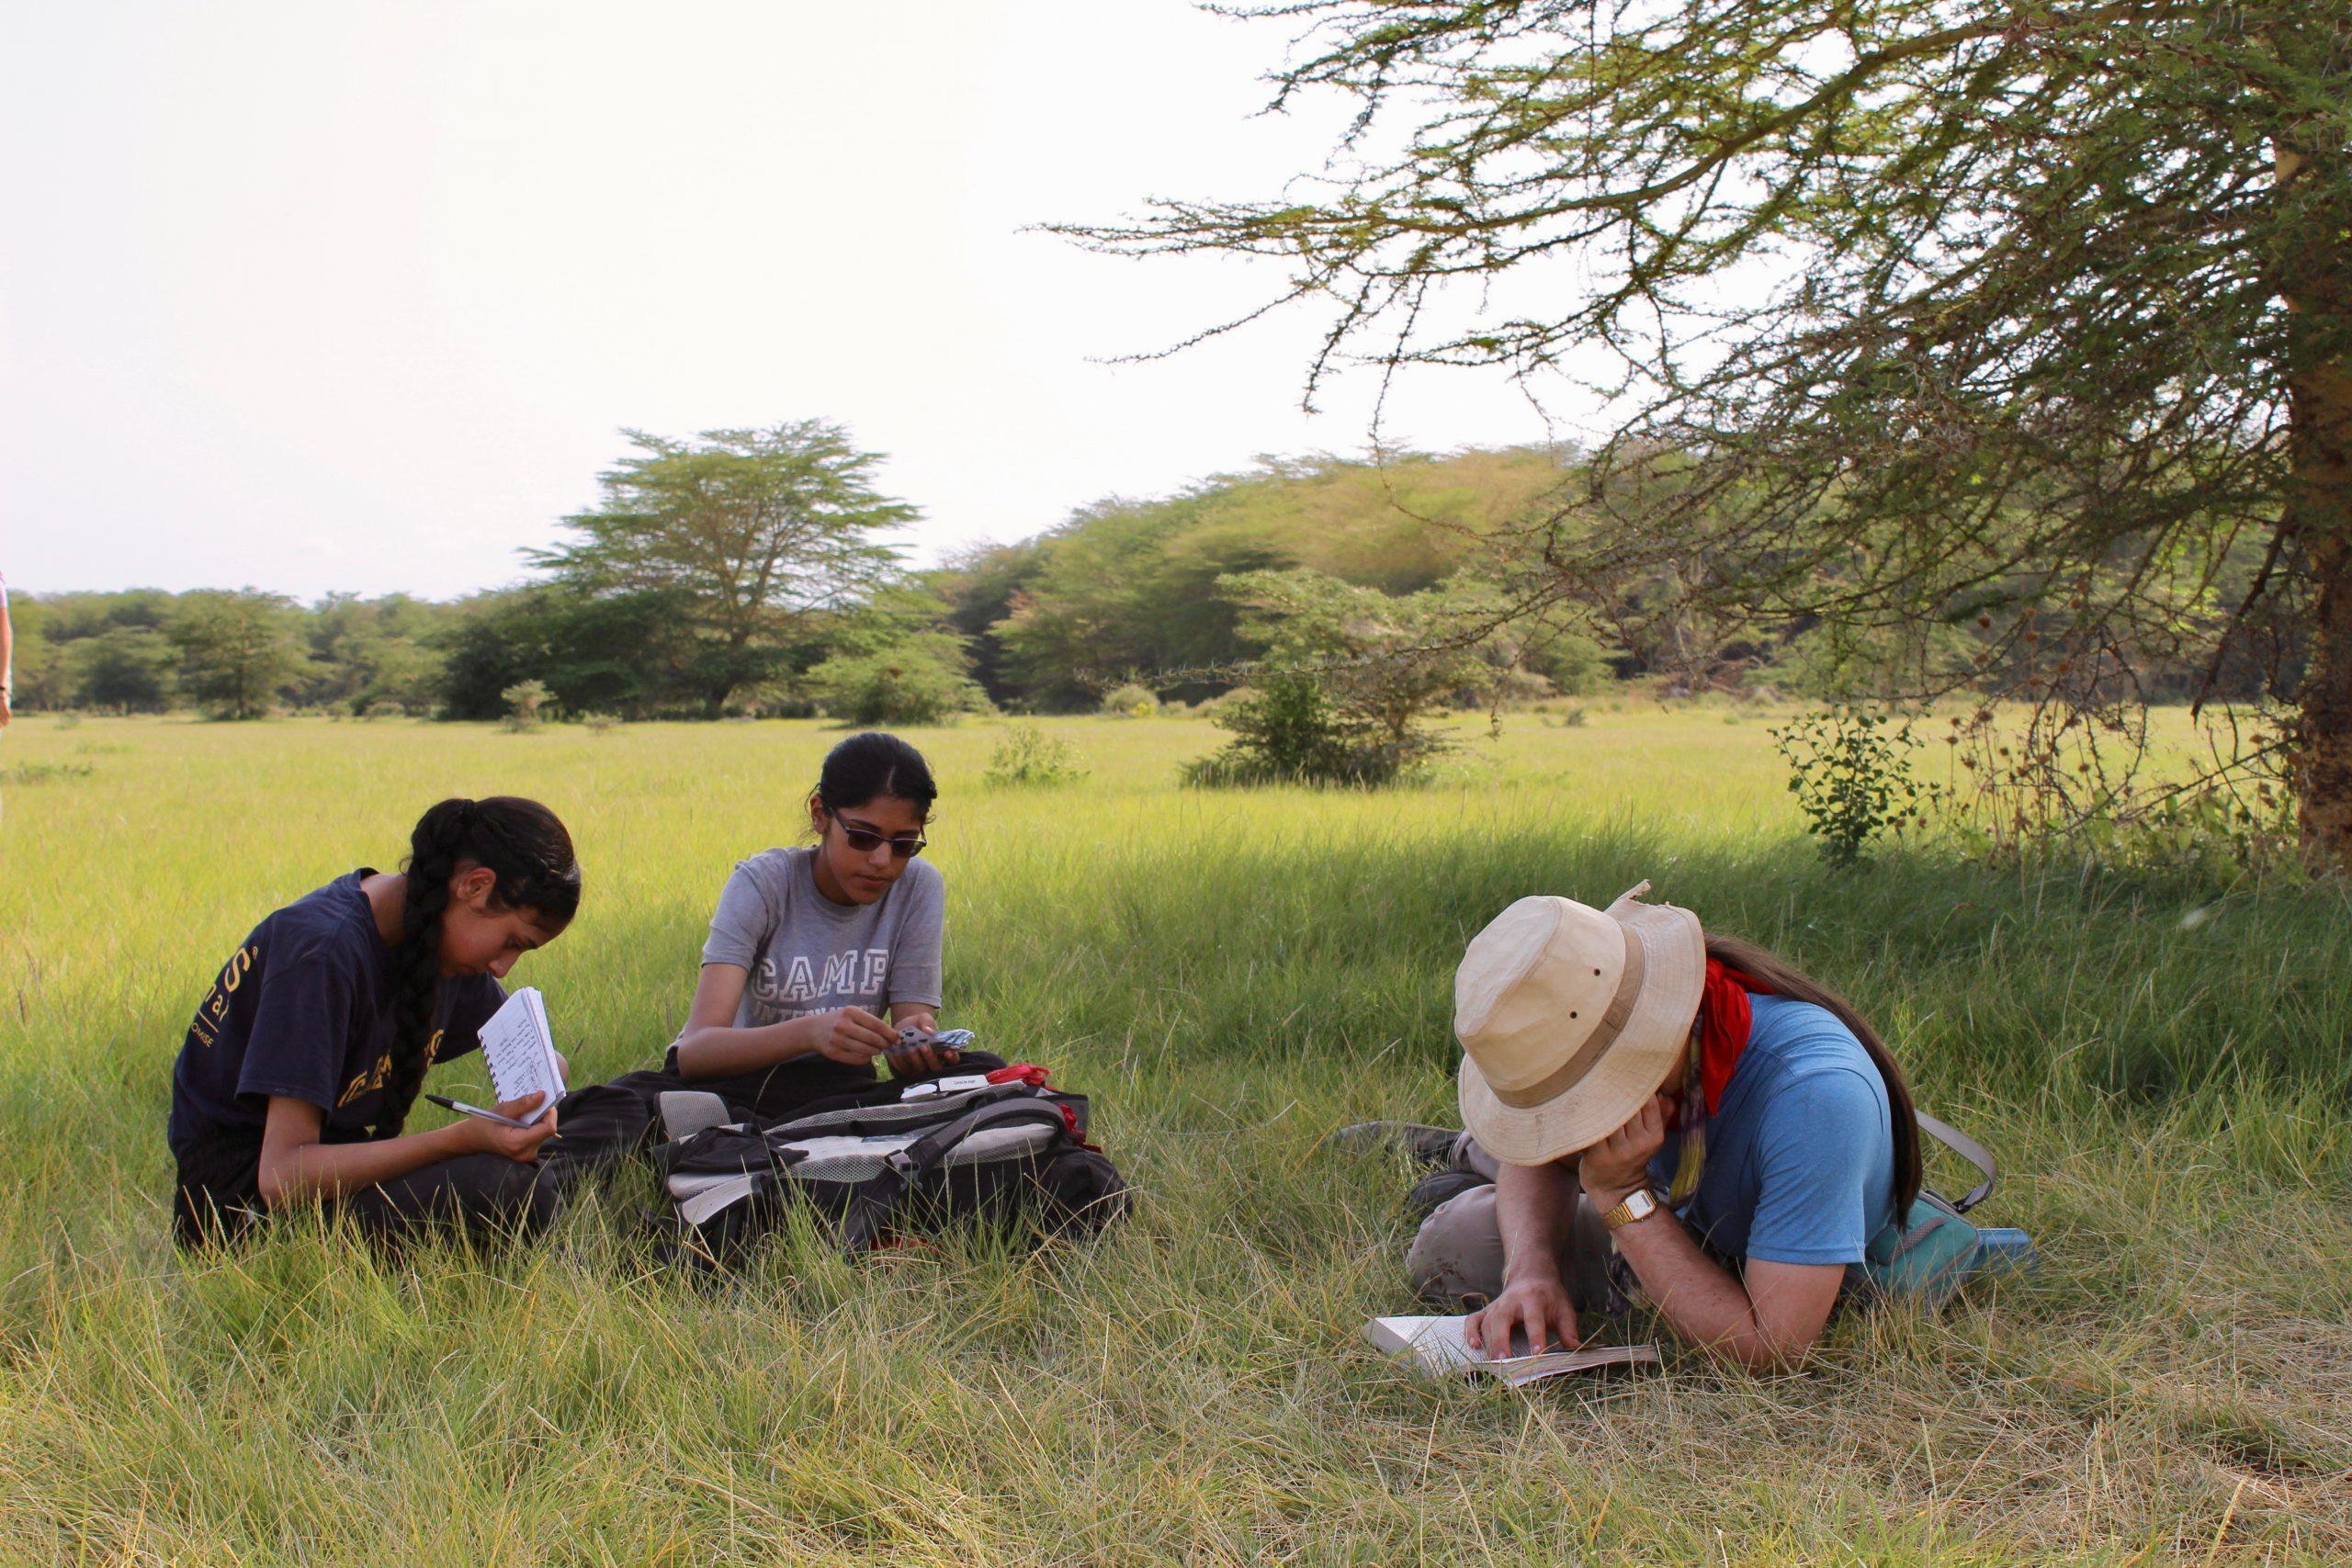 camps_international_earning_ucas_points_tanzania-2